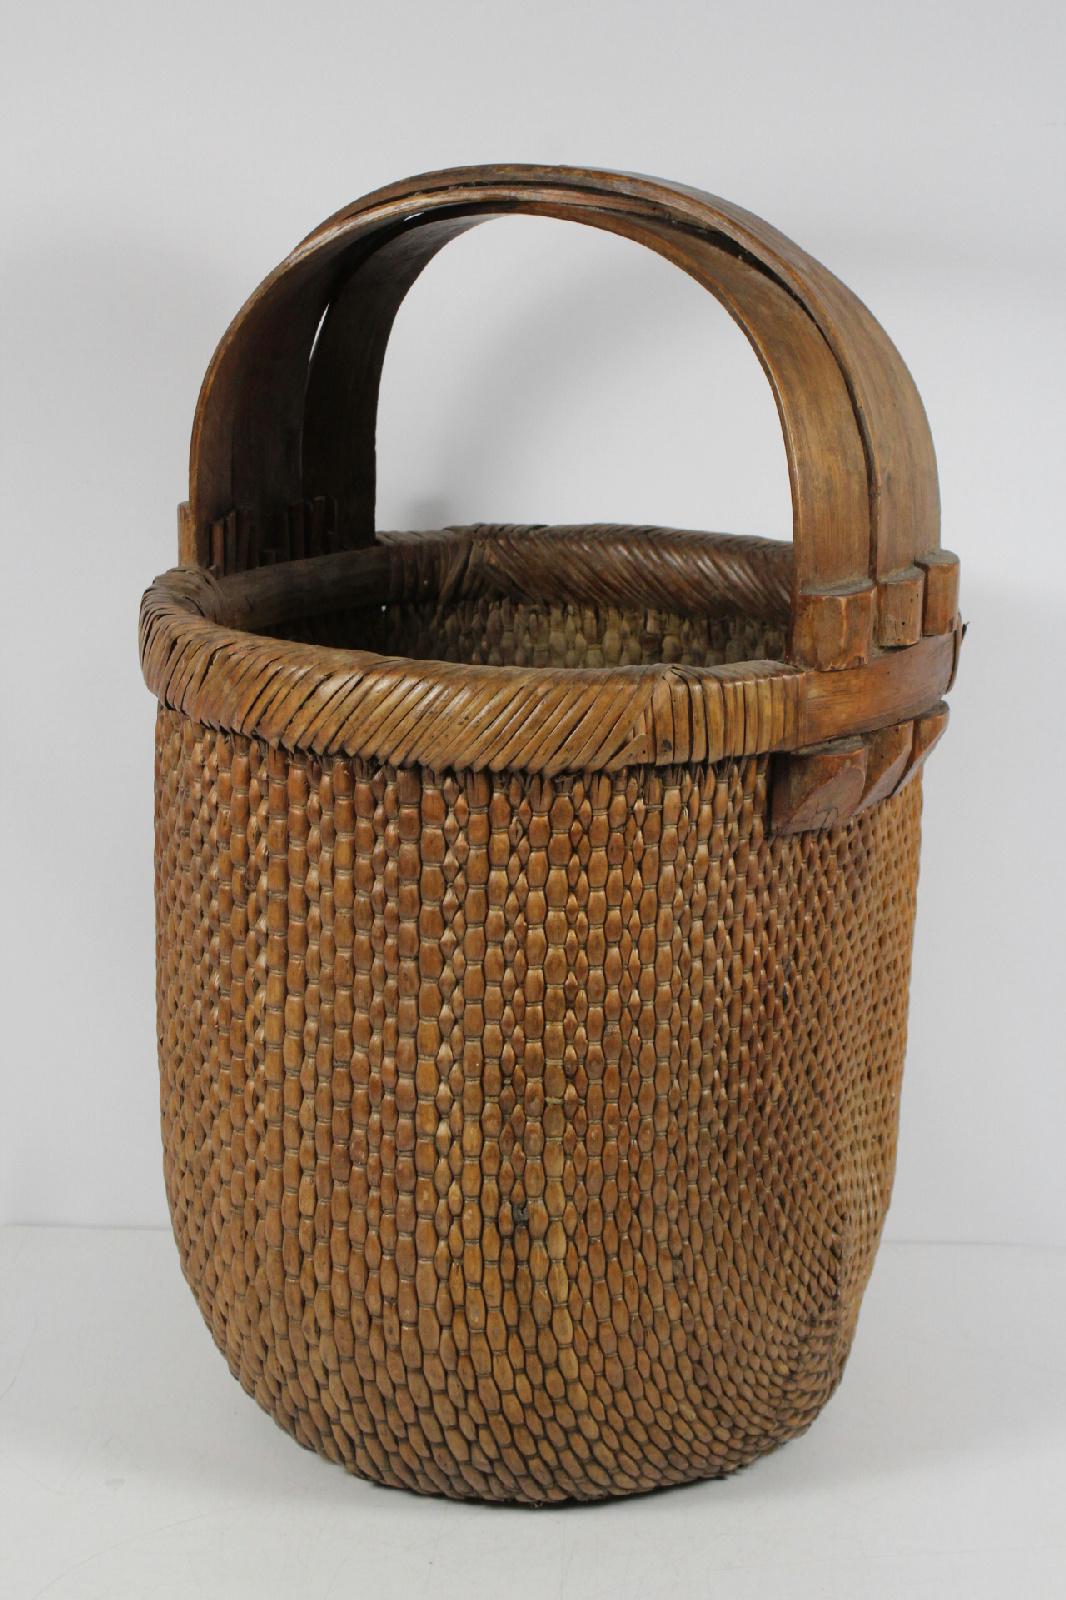 Woven Gathering Basket : Splint hand woven gathering basket bamboo handle large